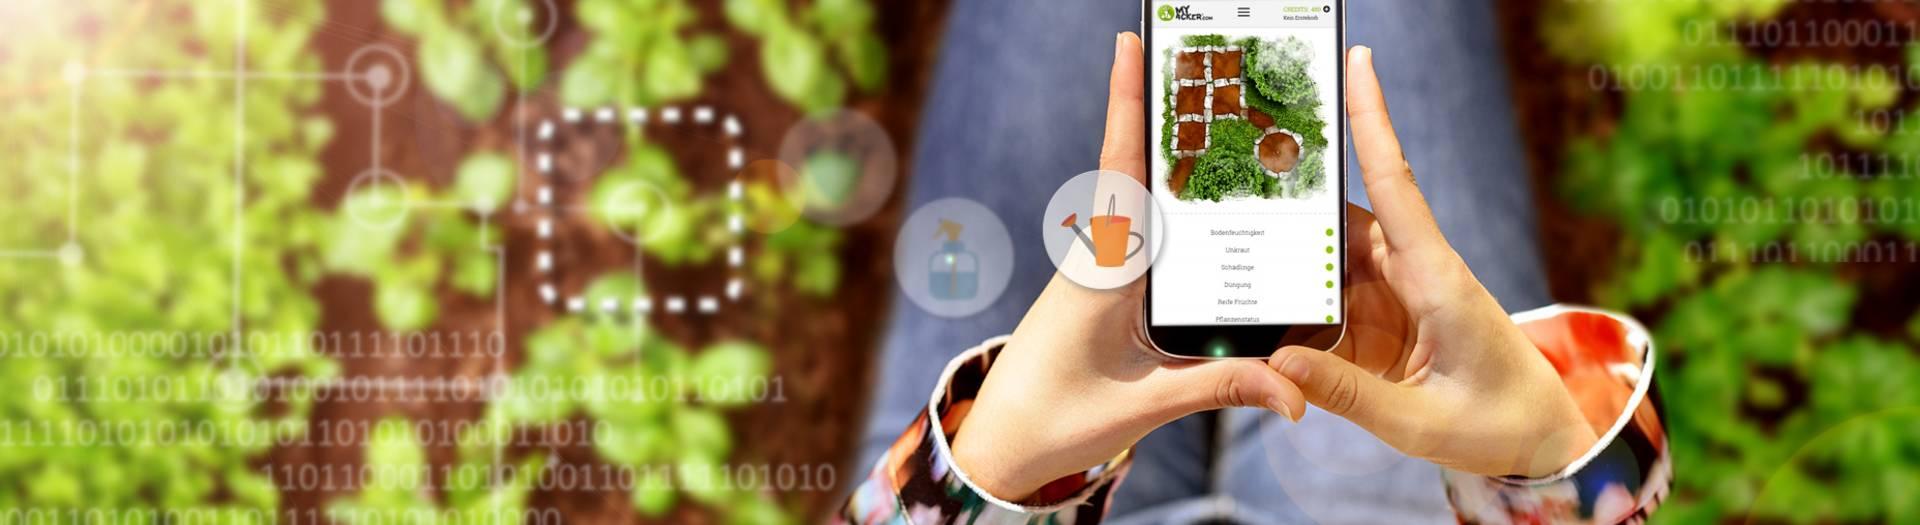 myAcker.com Smartphone